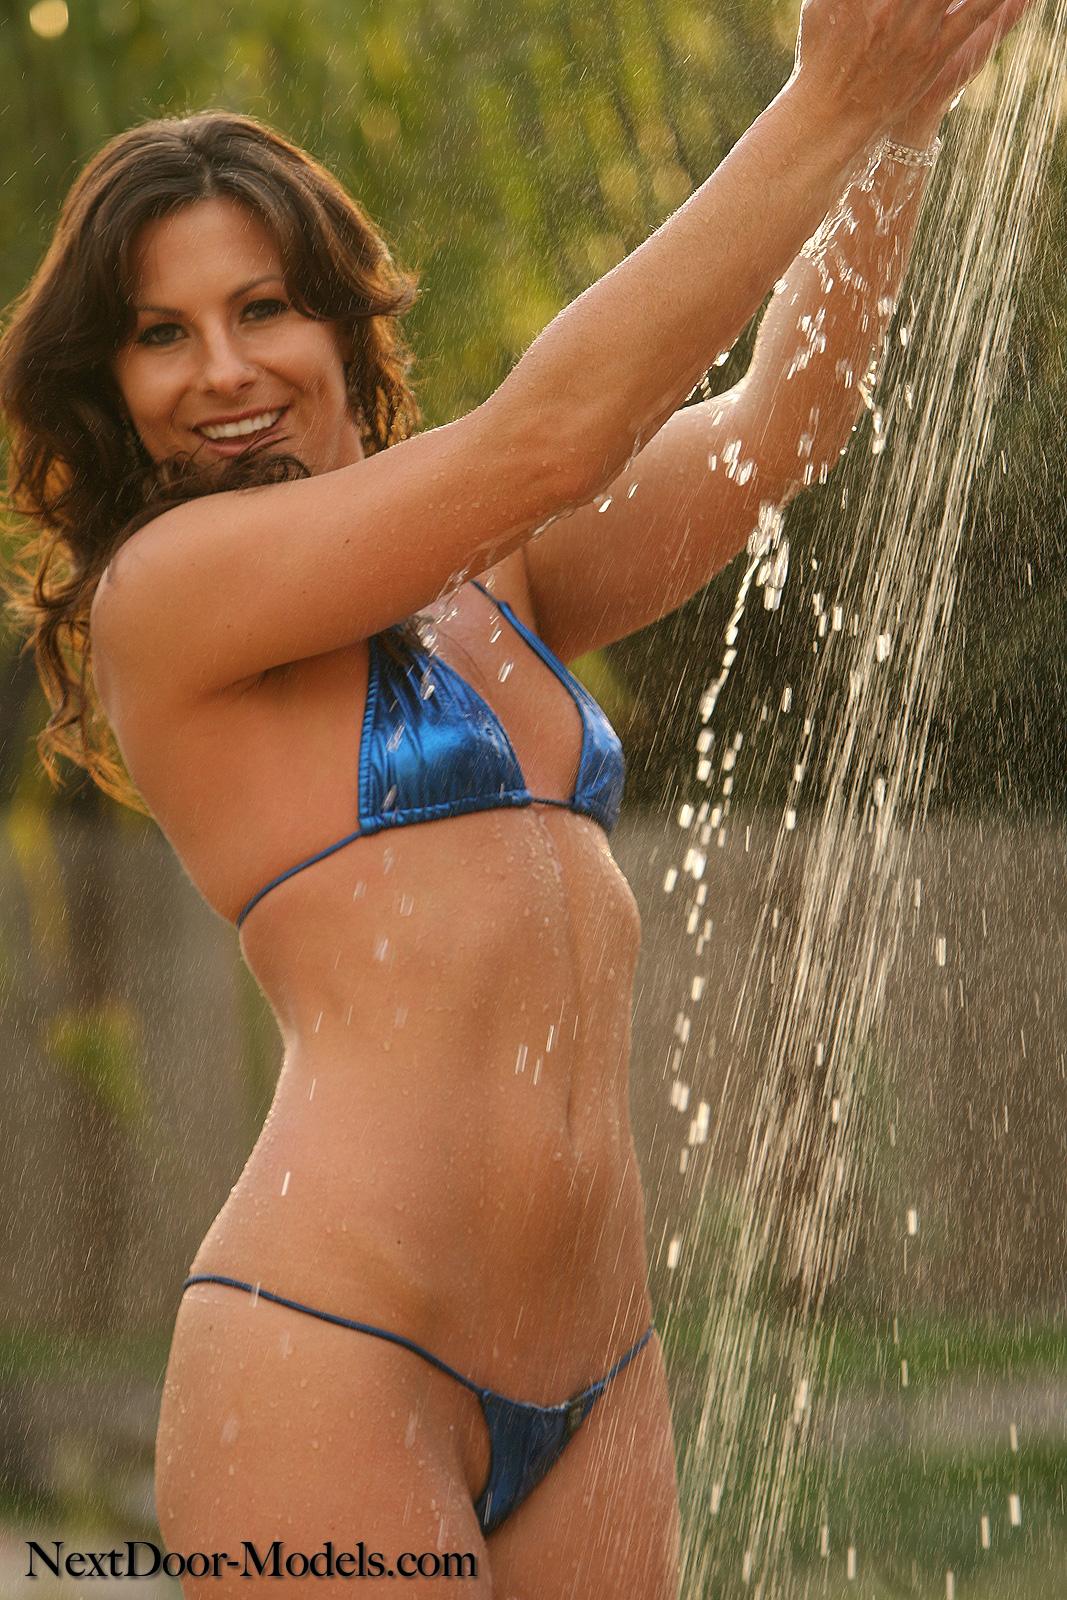 Next Door Models Veronia In A Tiny Blue Thong Bikini - Nnconnectcom-7873